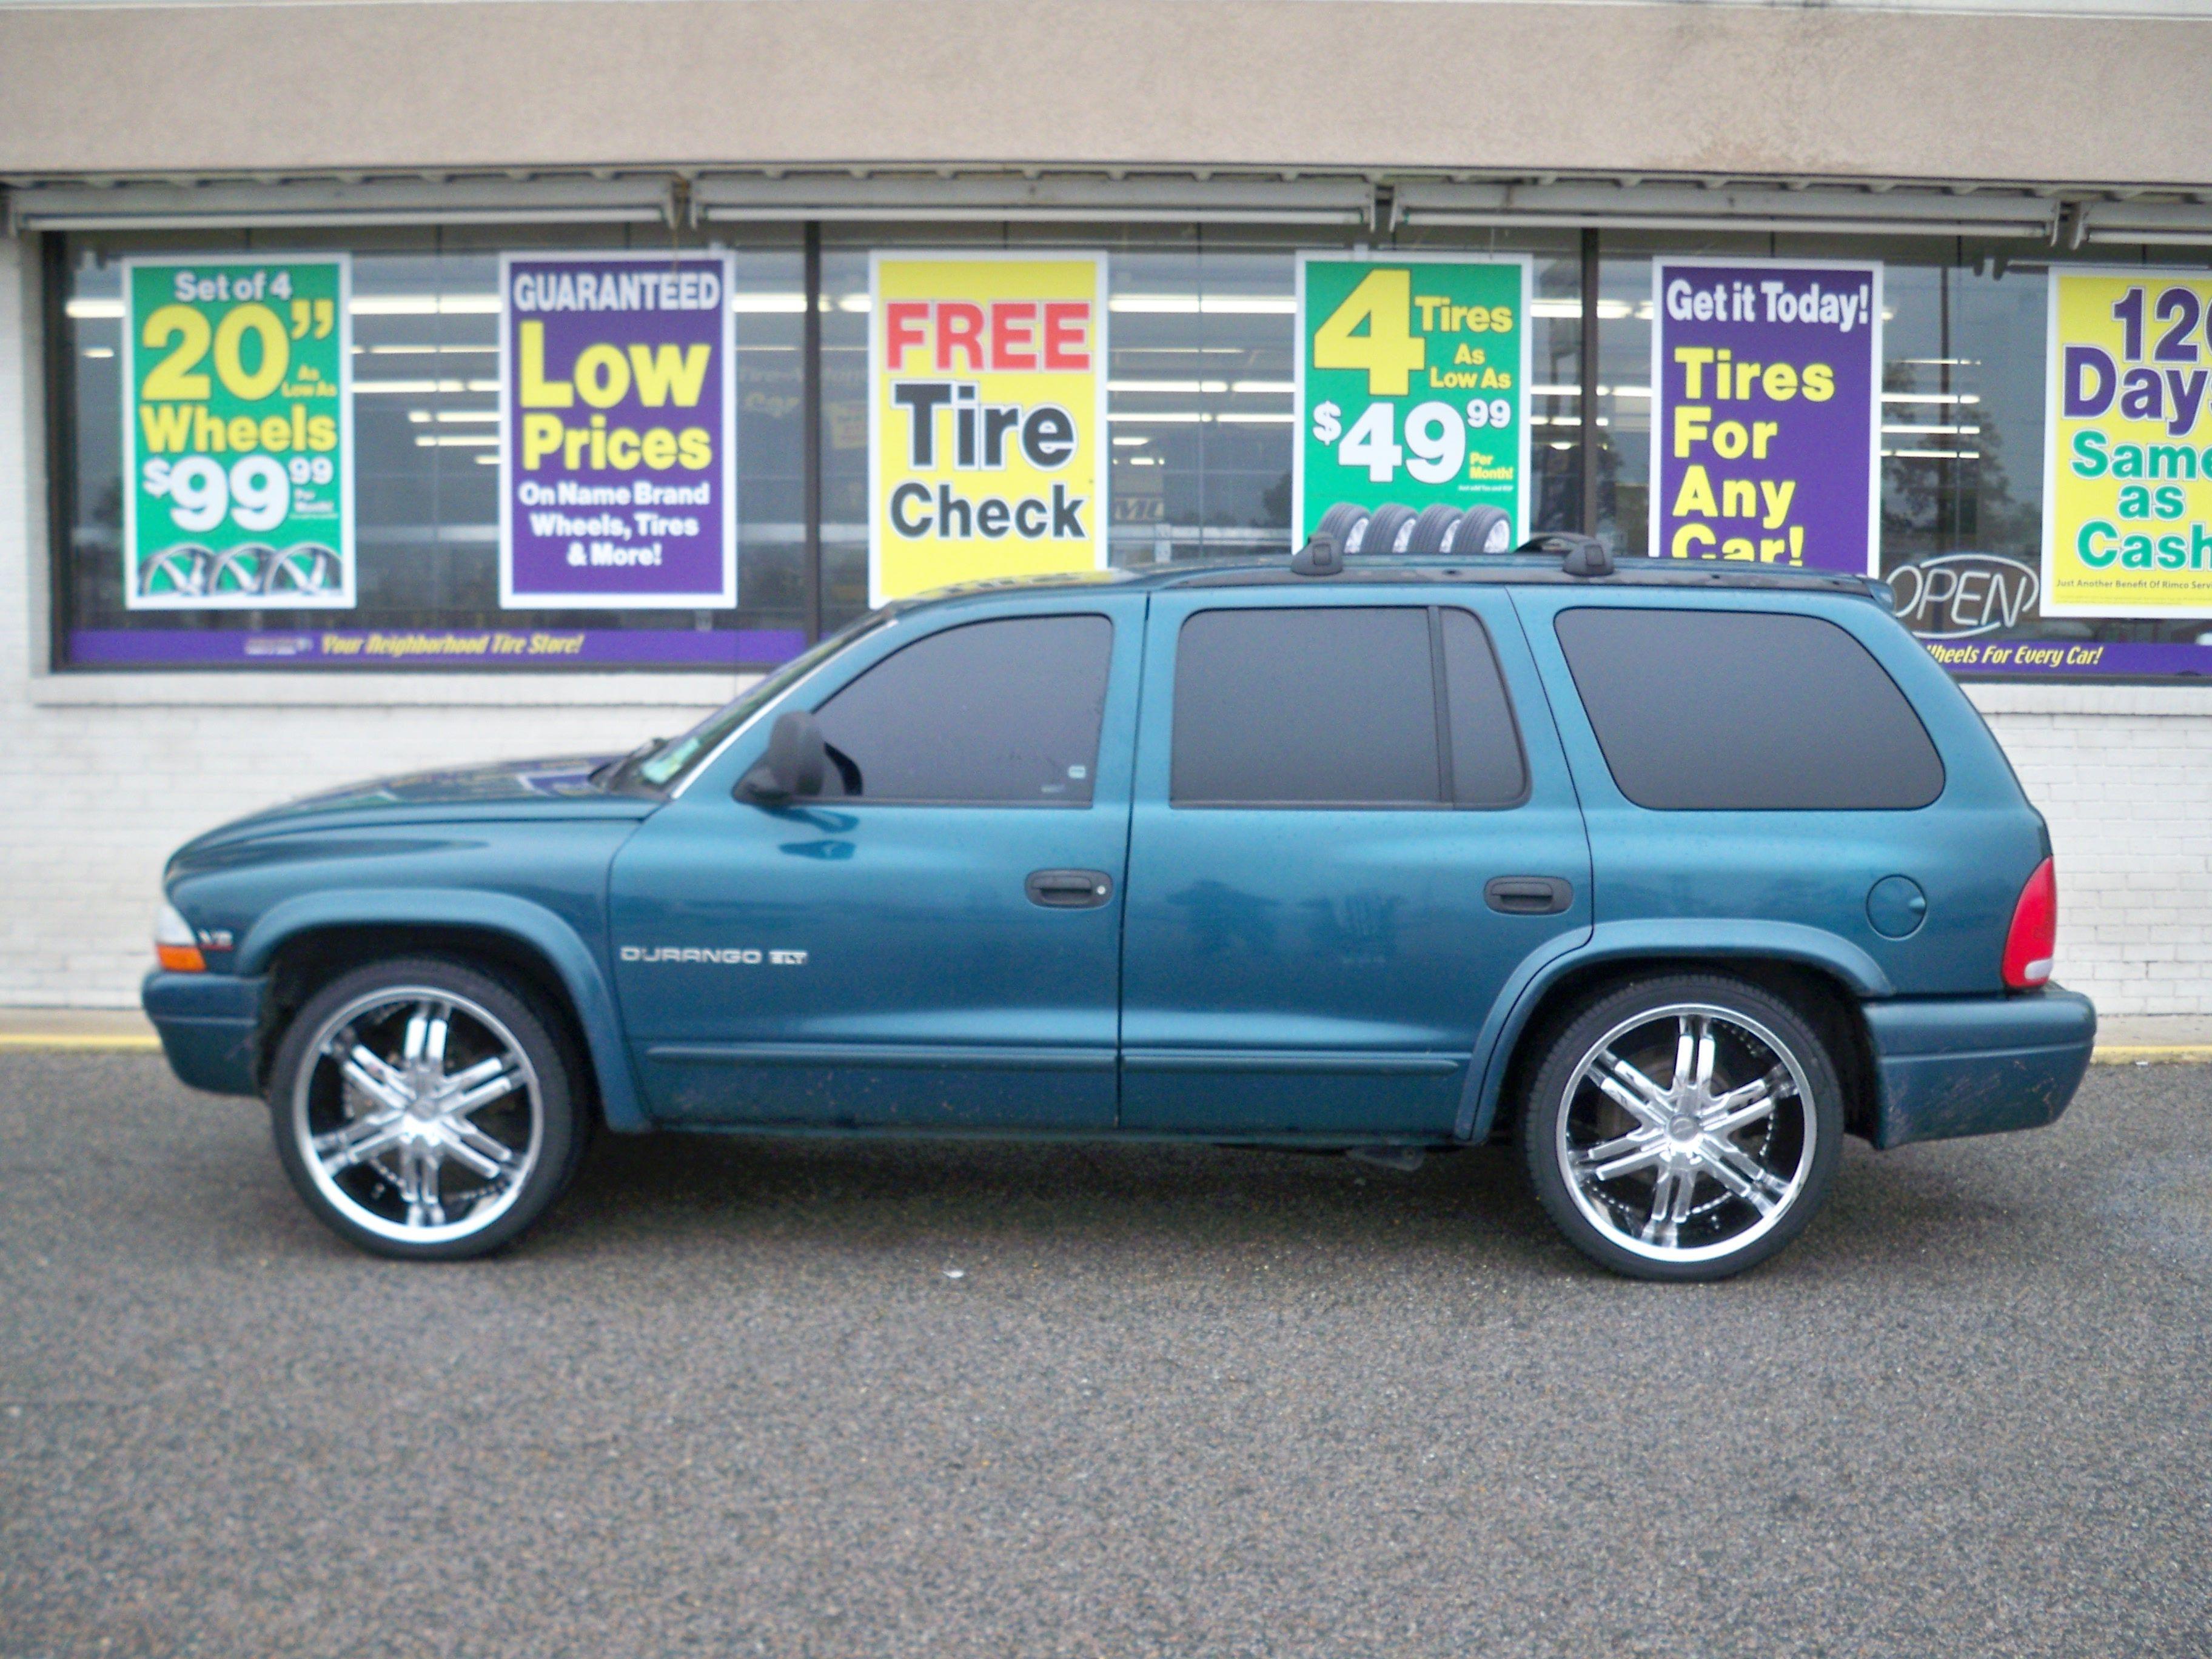 Rent A Tire Dodge Durango Trucks And Girls Custom Wheels